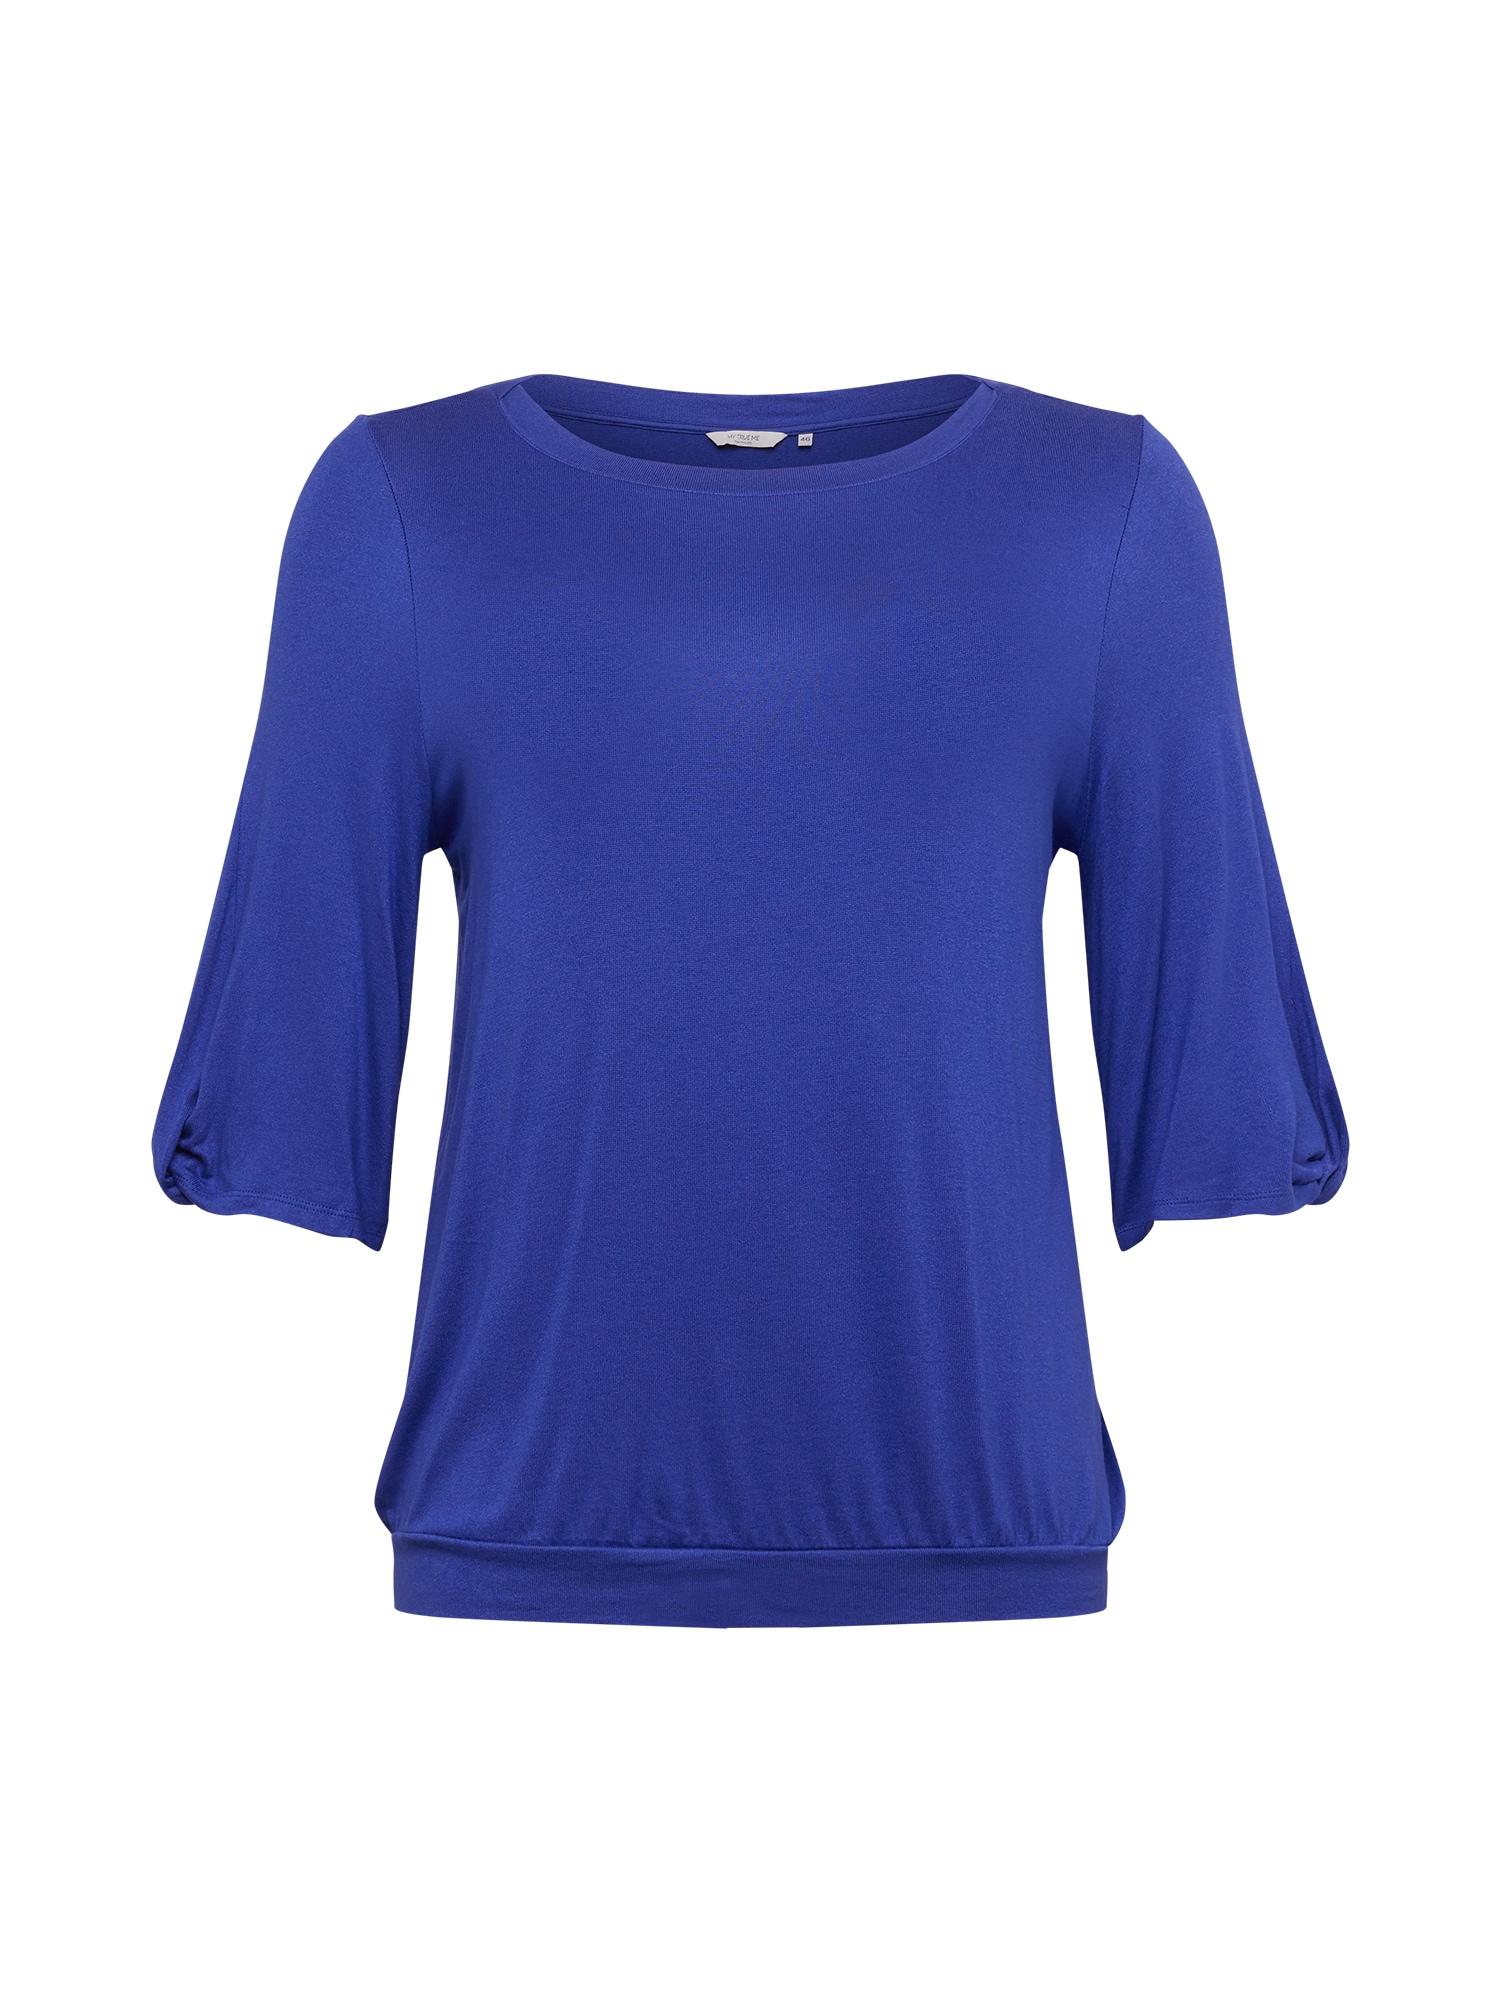 MY TRUE ME Marškinėliai mėlyna